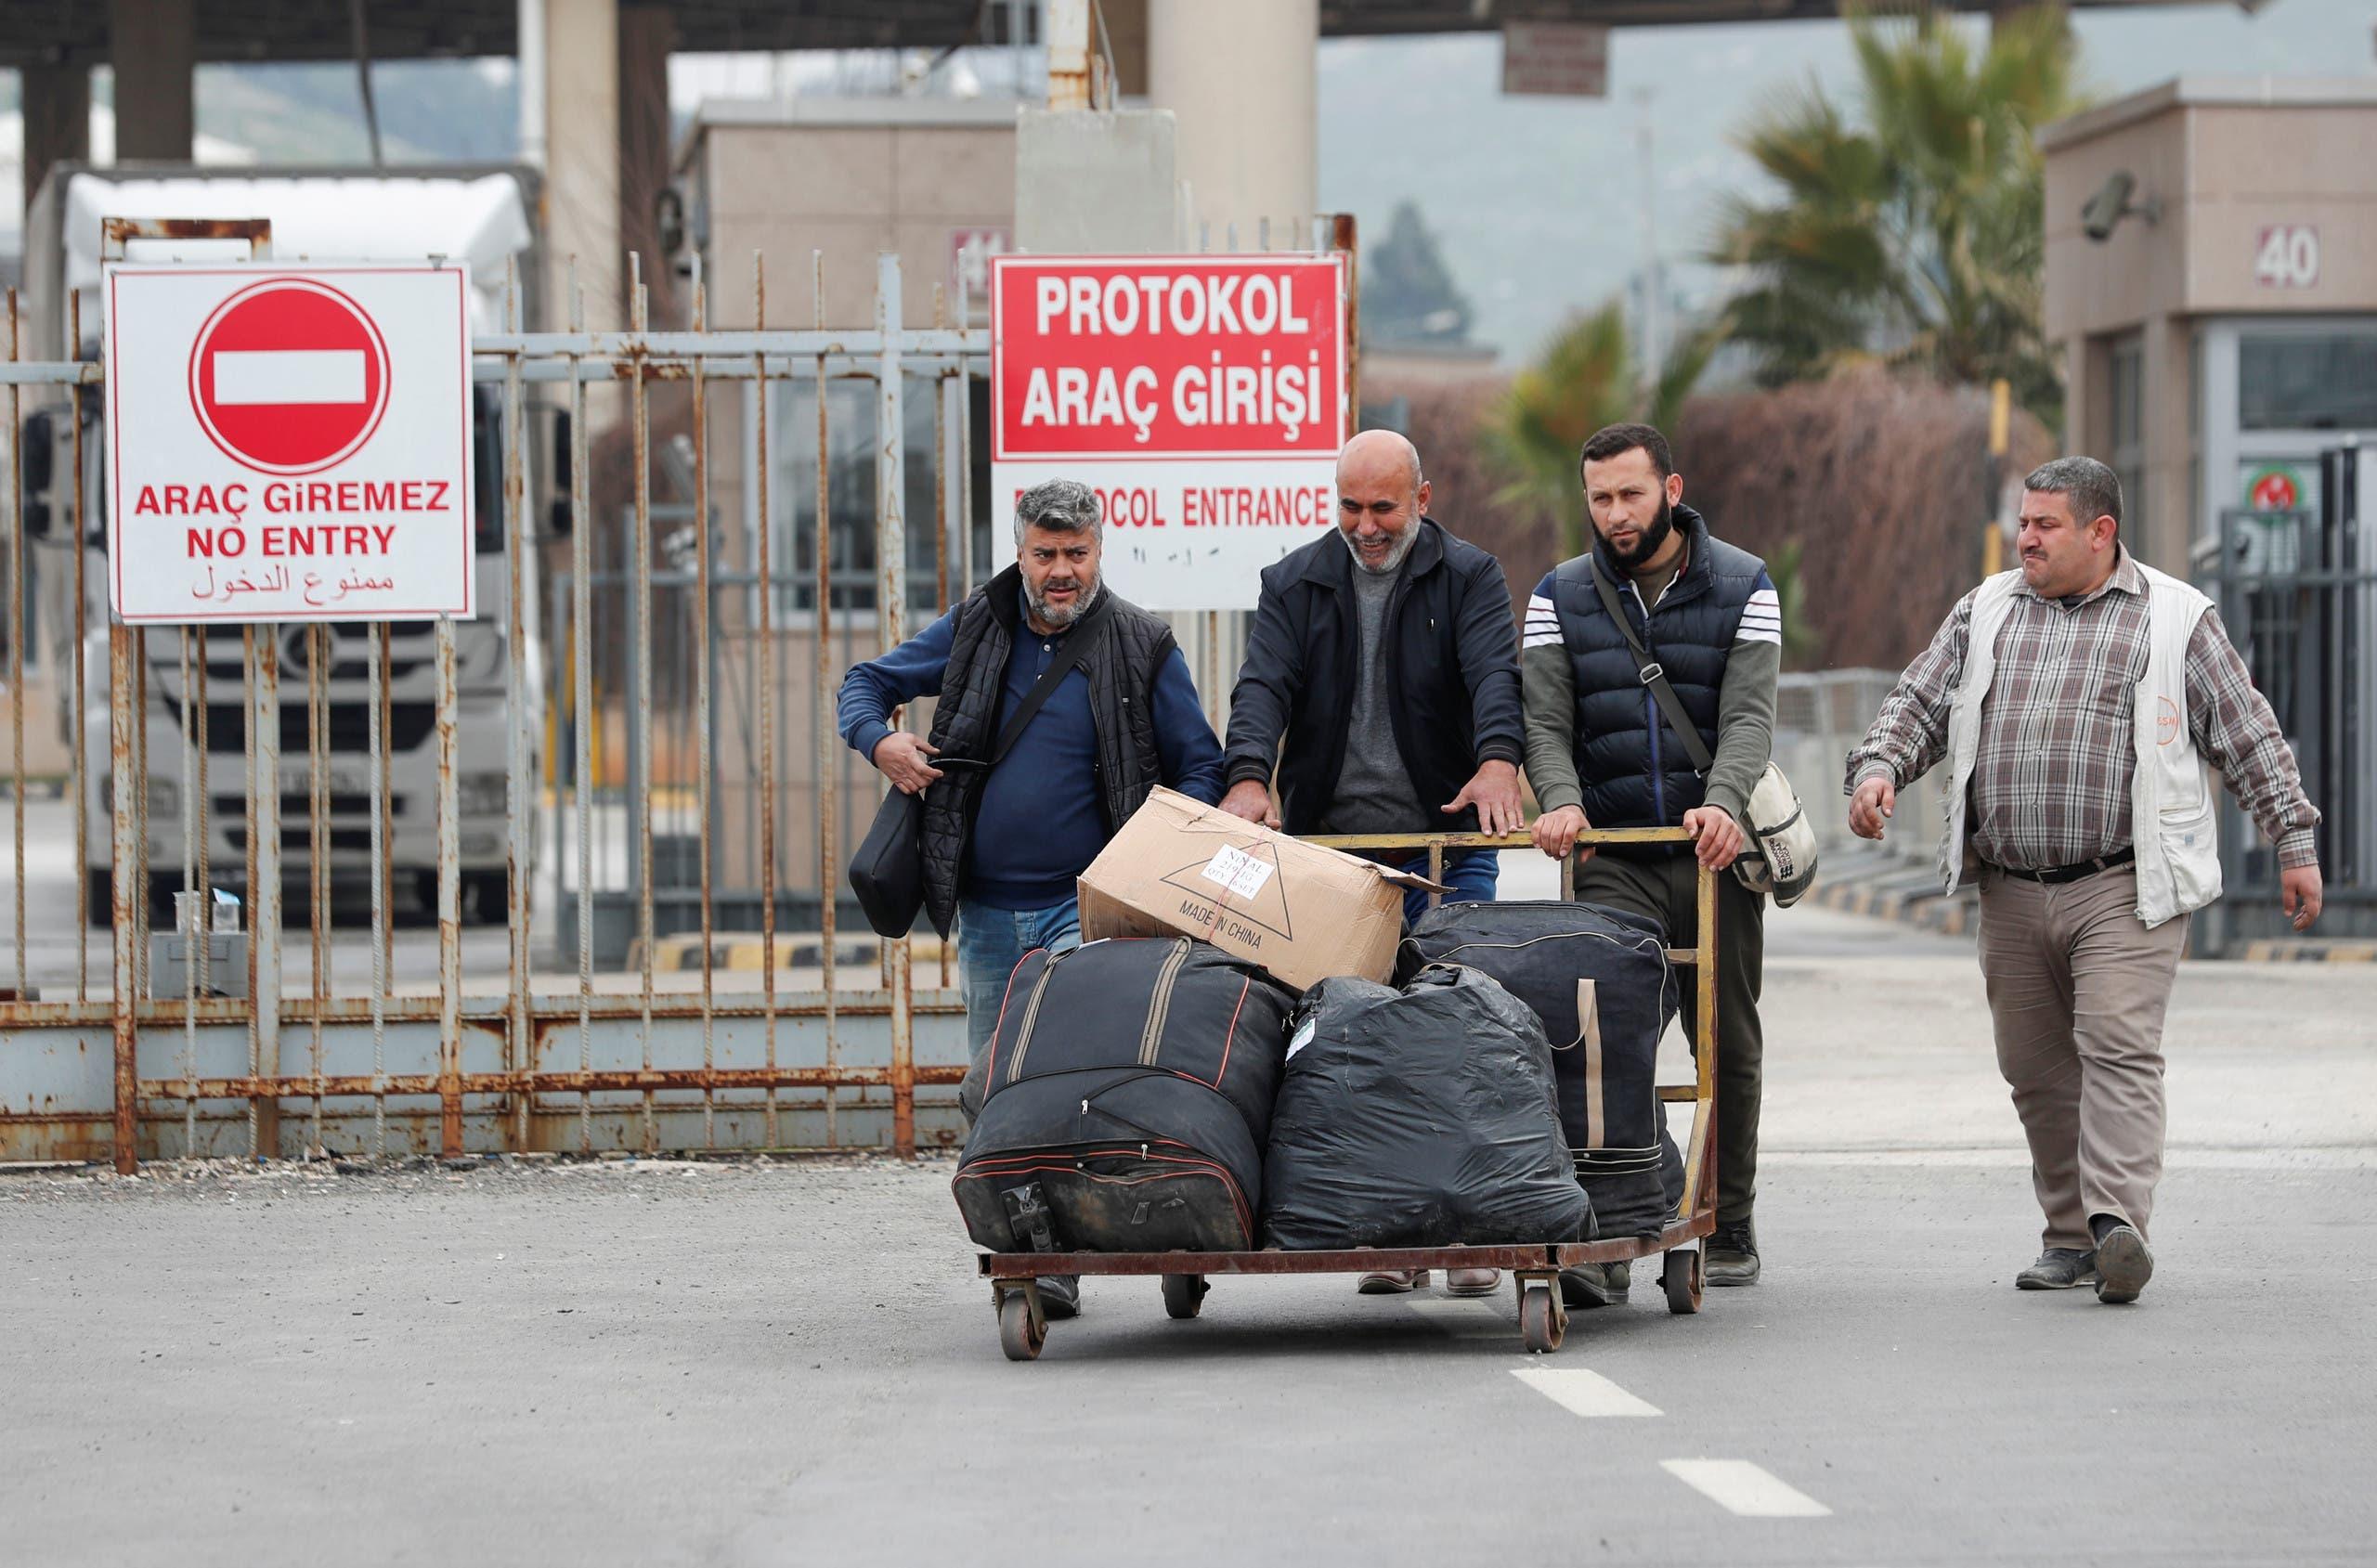 Syrians cross into Turkey through the Cilvegozu border gate, located opposite the Syrian commercial crossing point Bab al-Hawa, in Reyhanli, Hatay province, Turkey, February 28, 2020. (Reuters)